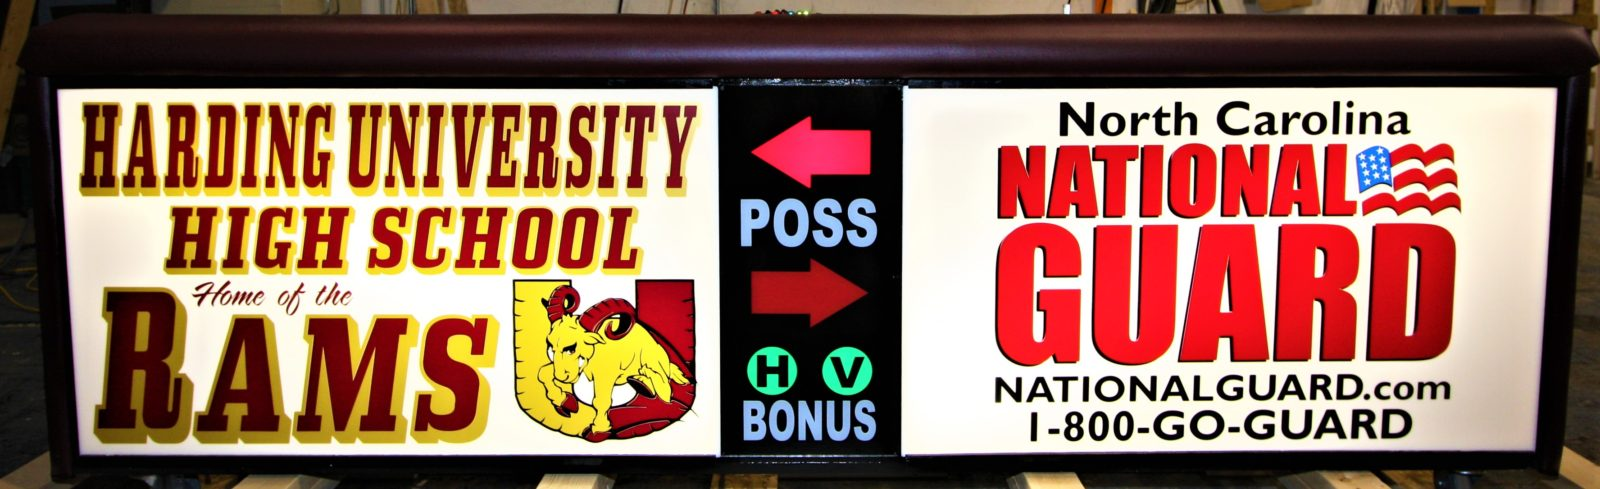 Harding University high school scoring table North Carolina Army National Guard NCARNG